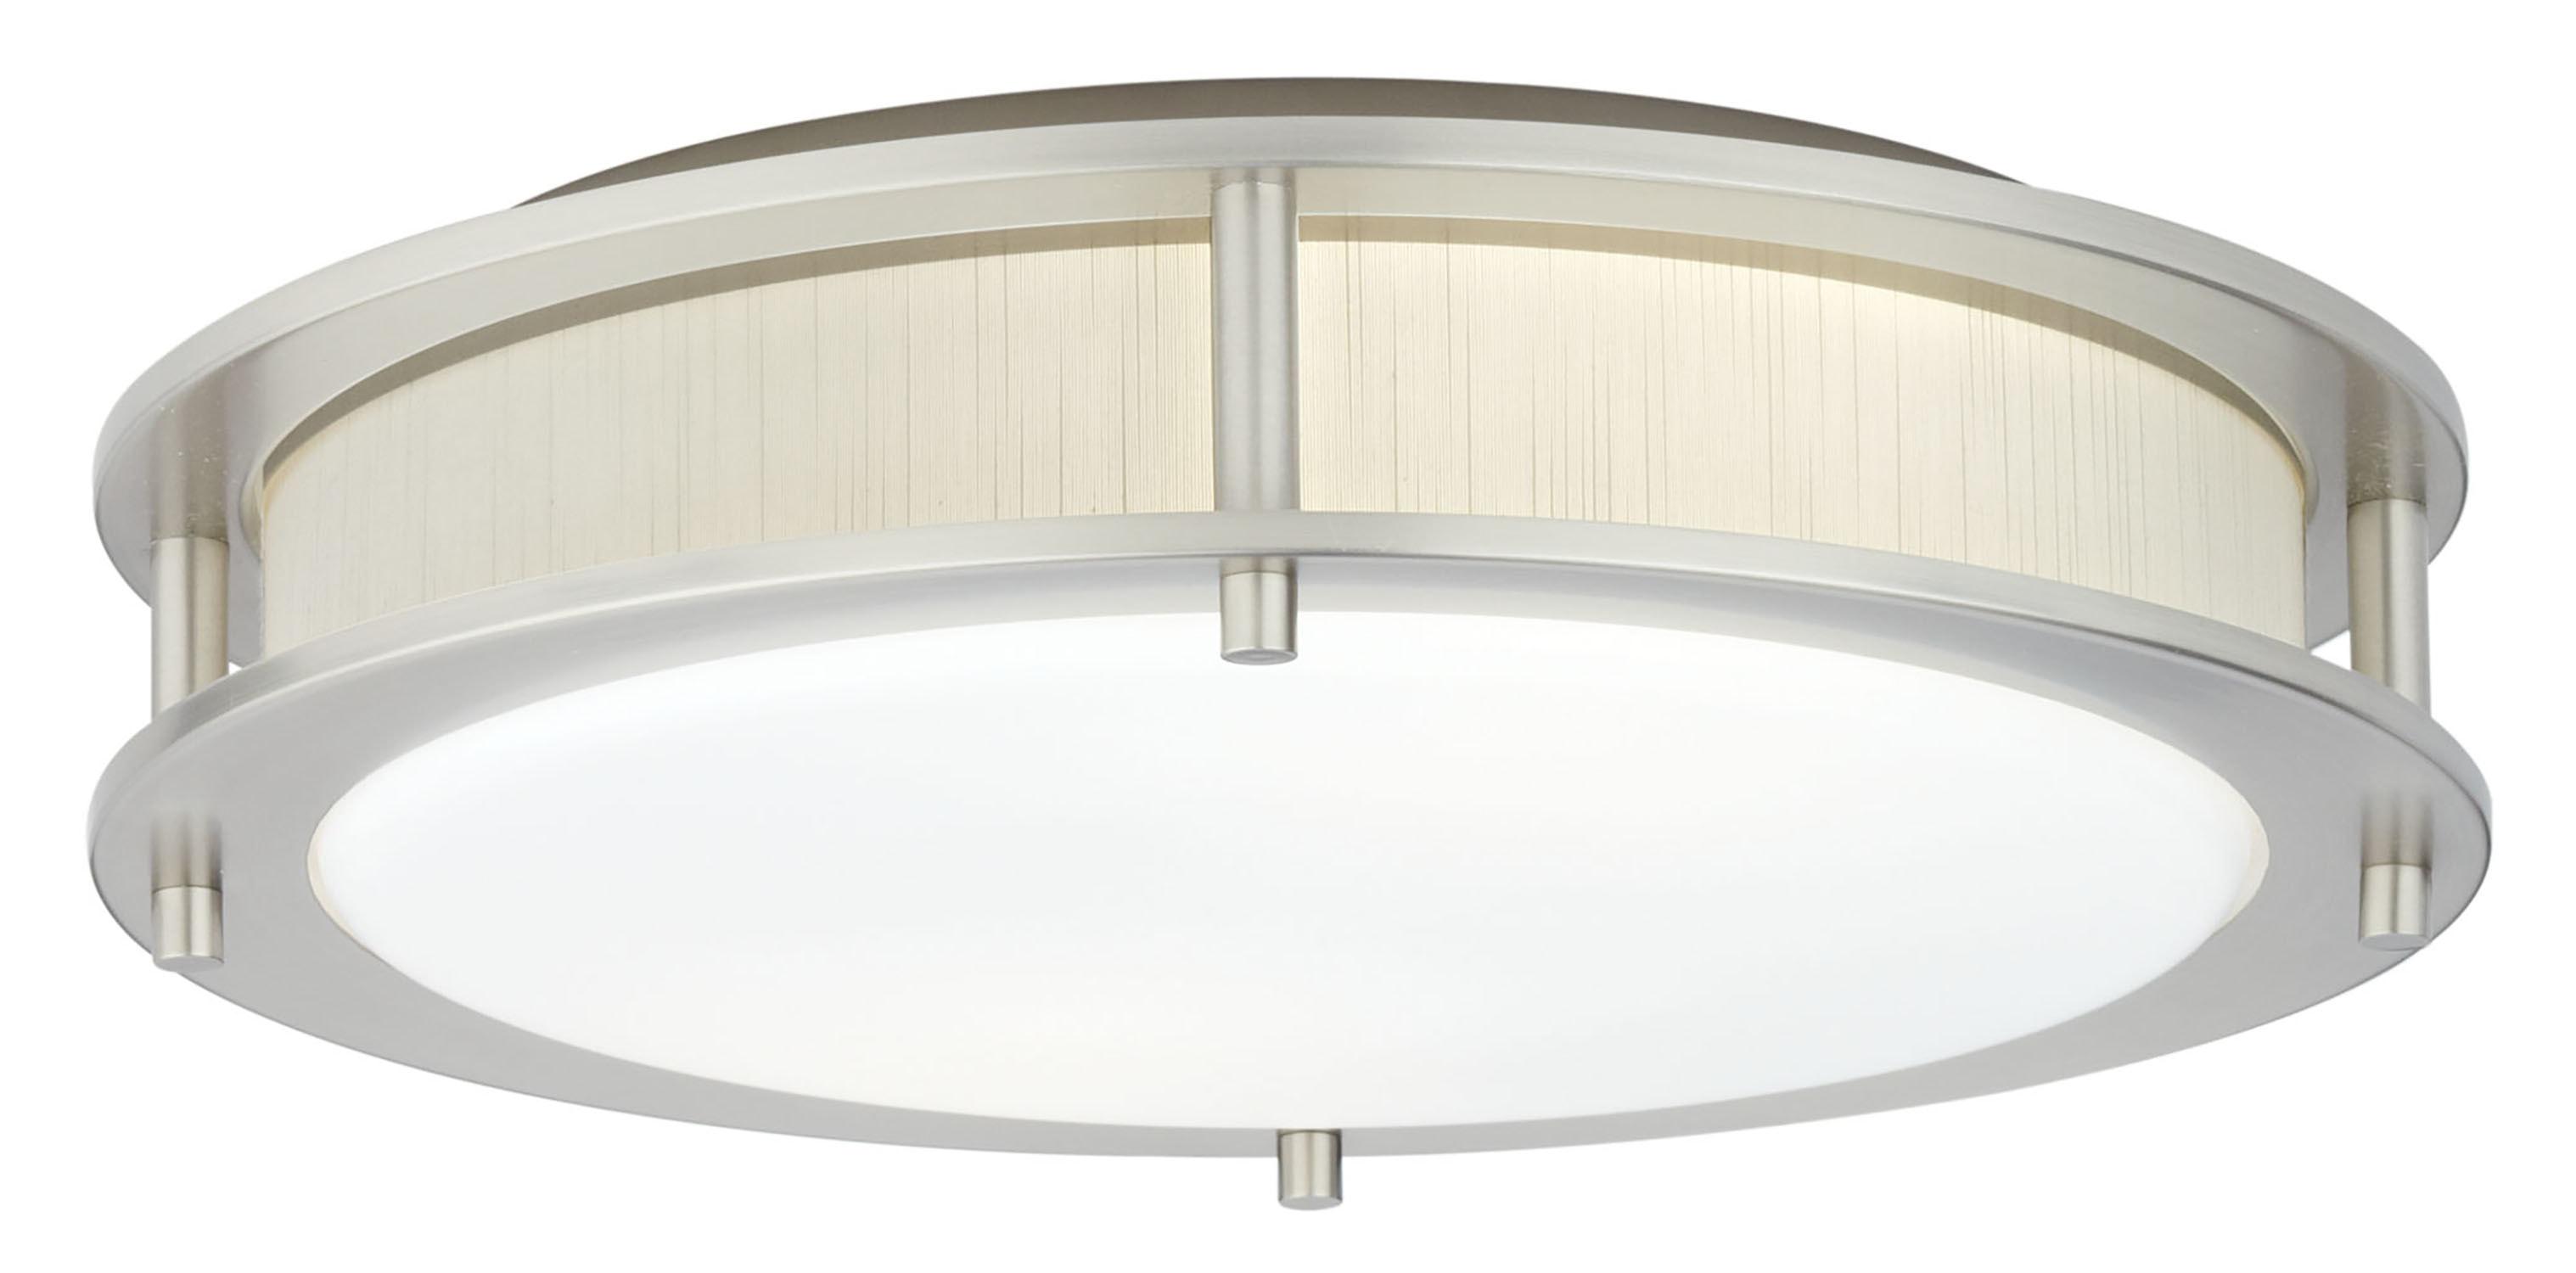 Satin Nickel / Indoor / 2 Satin Nickel 17in. Semi-Flush with Raw White Fabric Insert 0